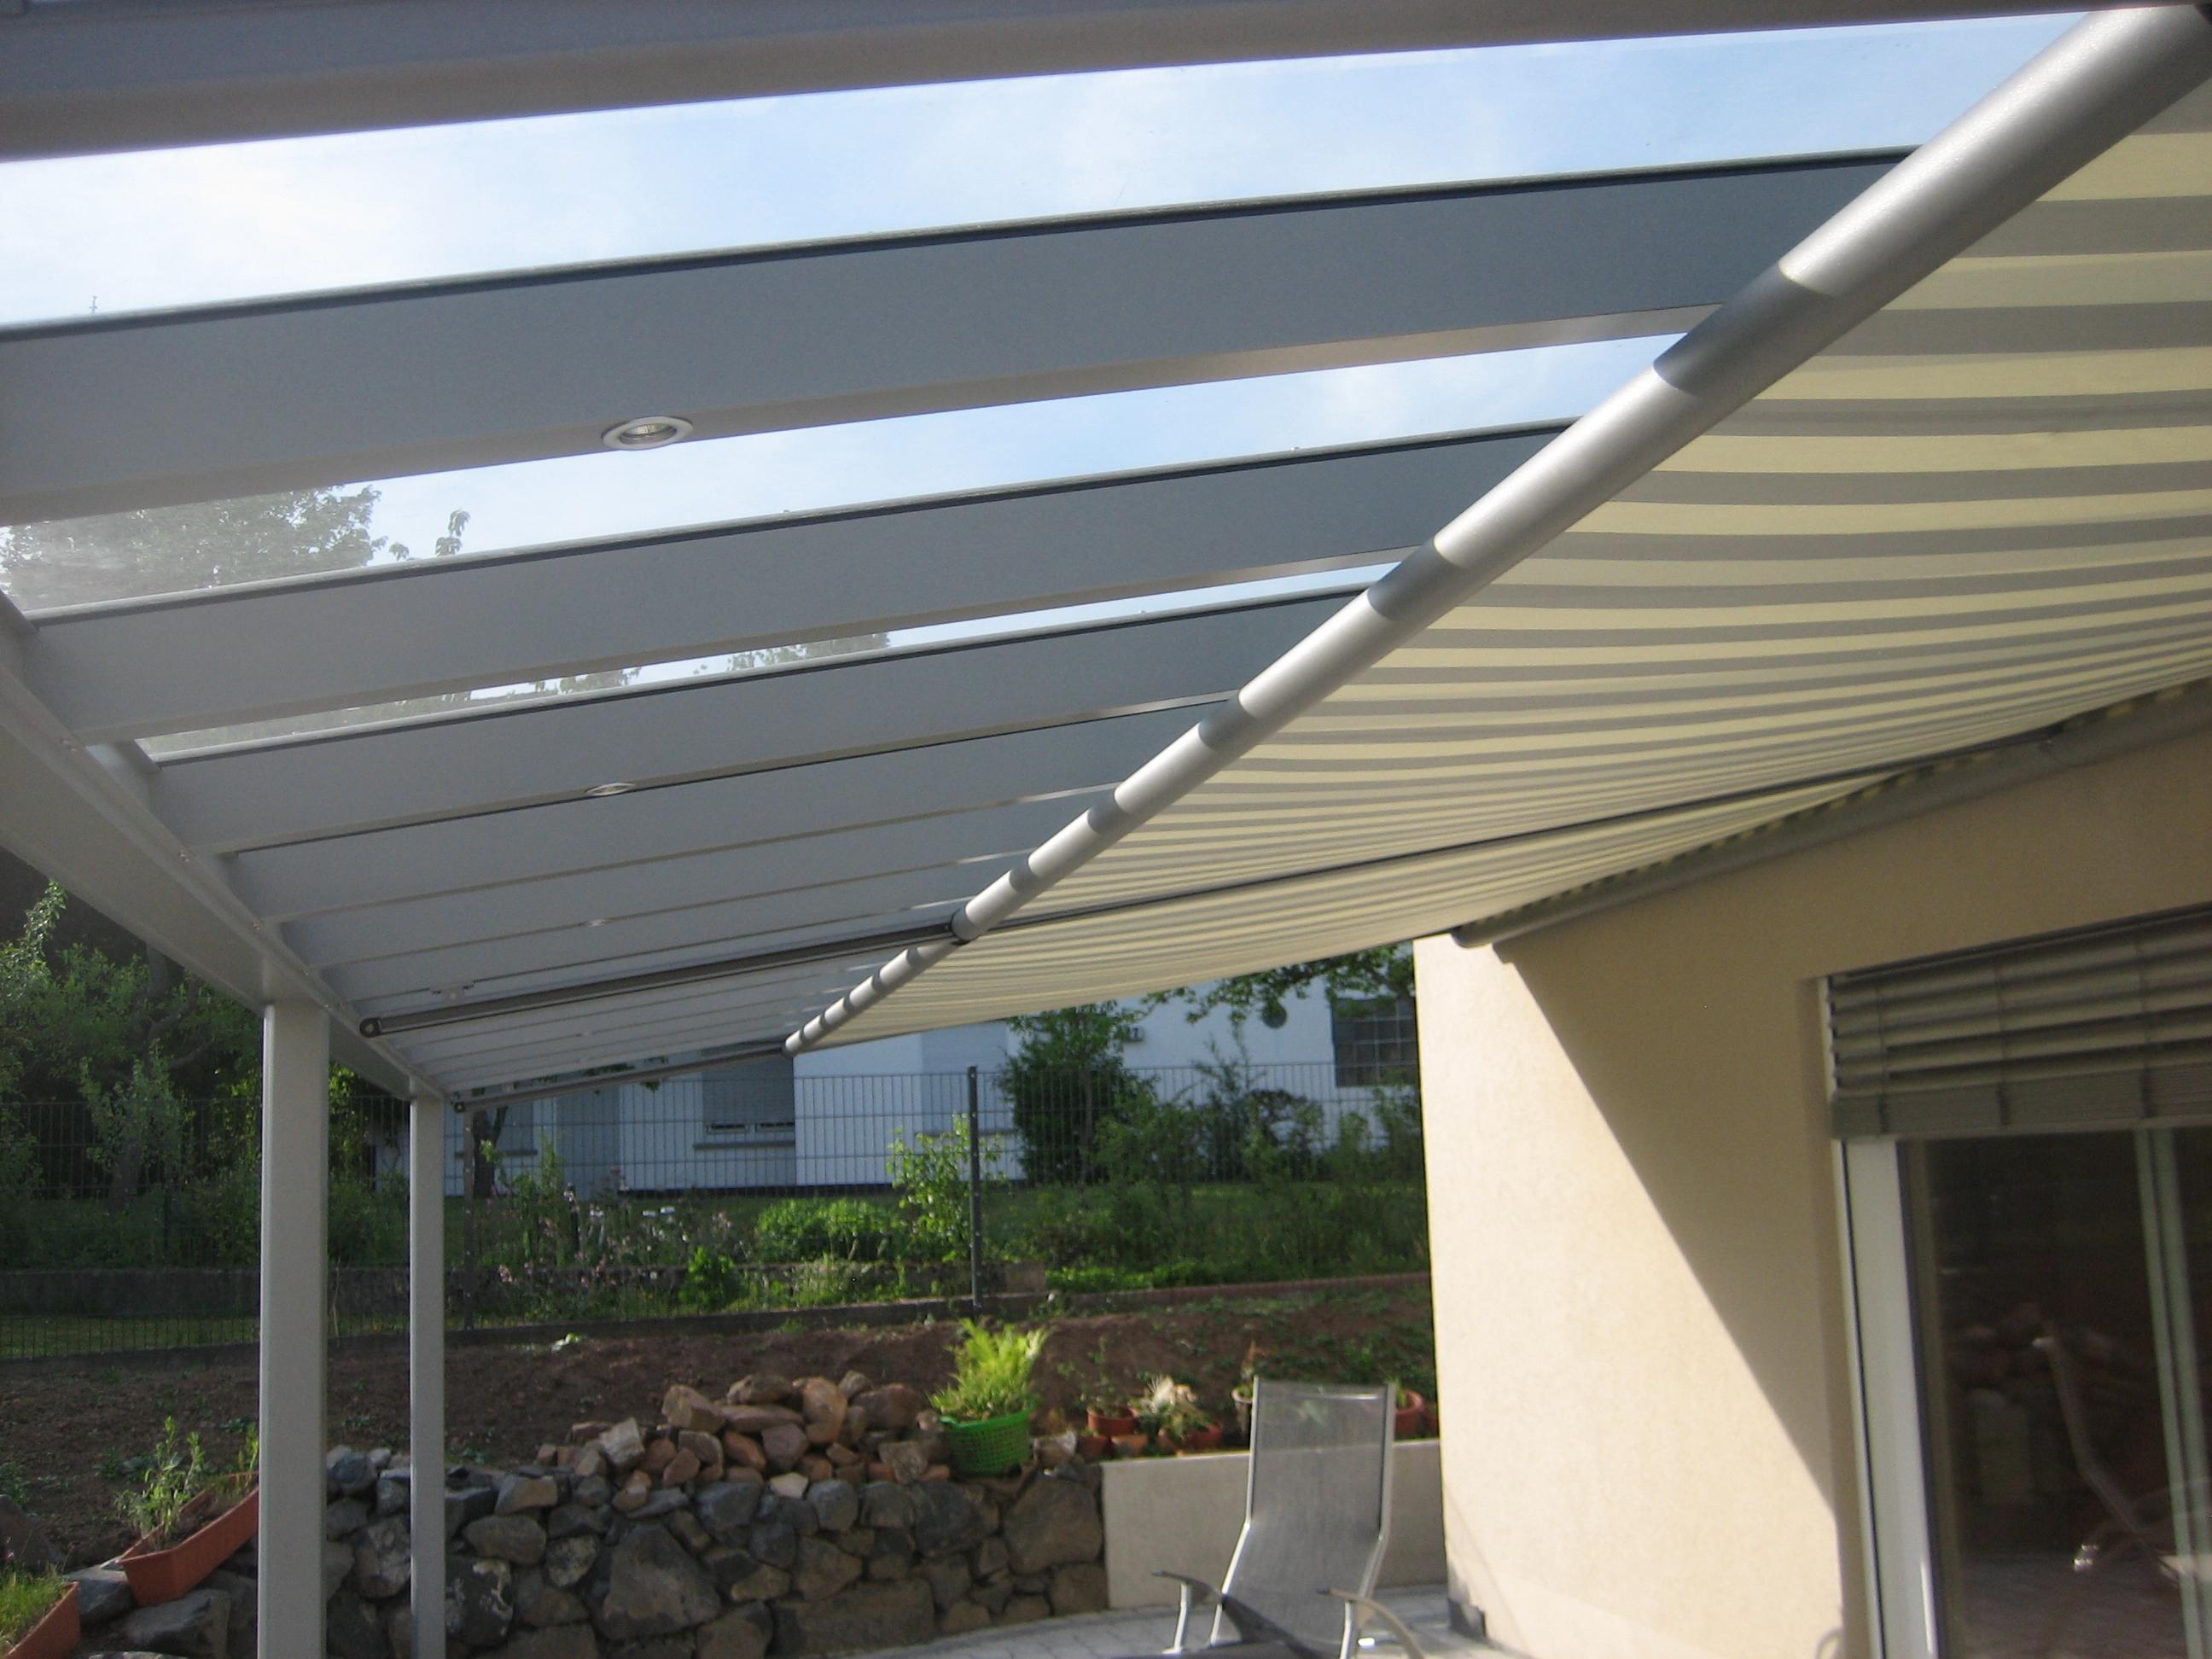 aluminium_terrasendach_unterglasmarkise_beleuchtung